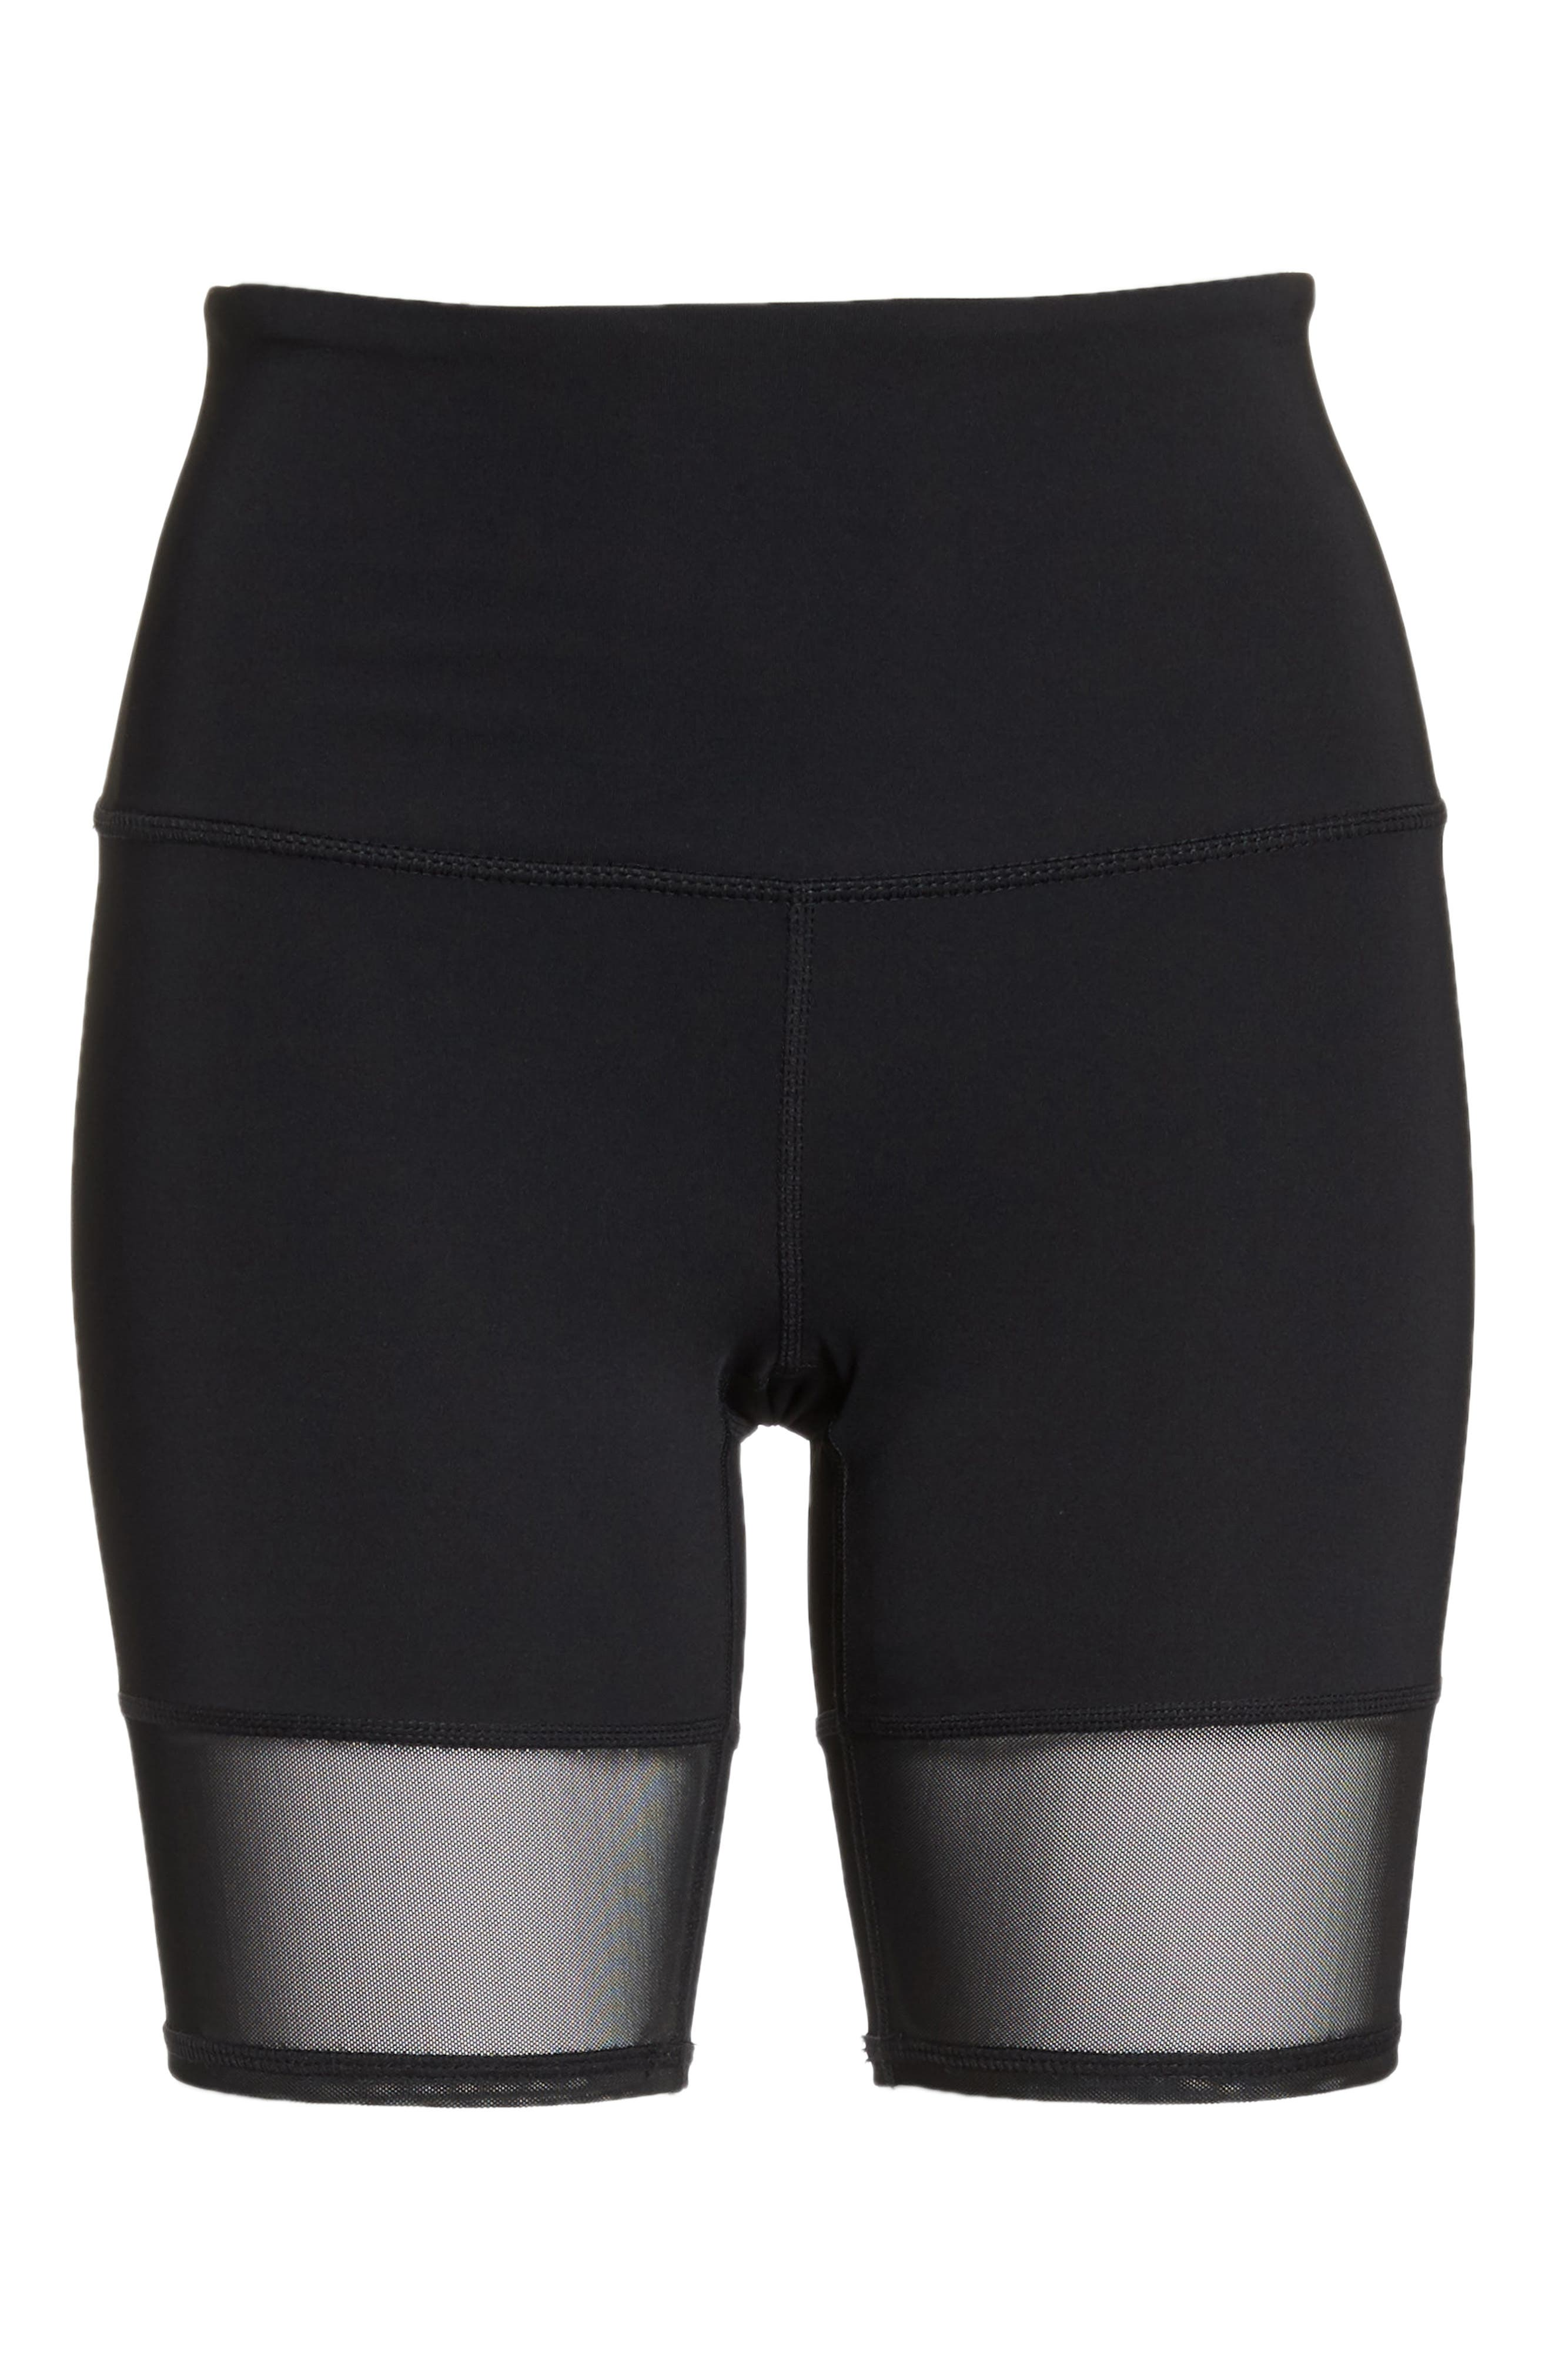 Mia Vision High Waist Mesh Bike Shorts,                             Alternate thumbnail 7, color,                             001